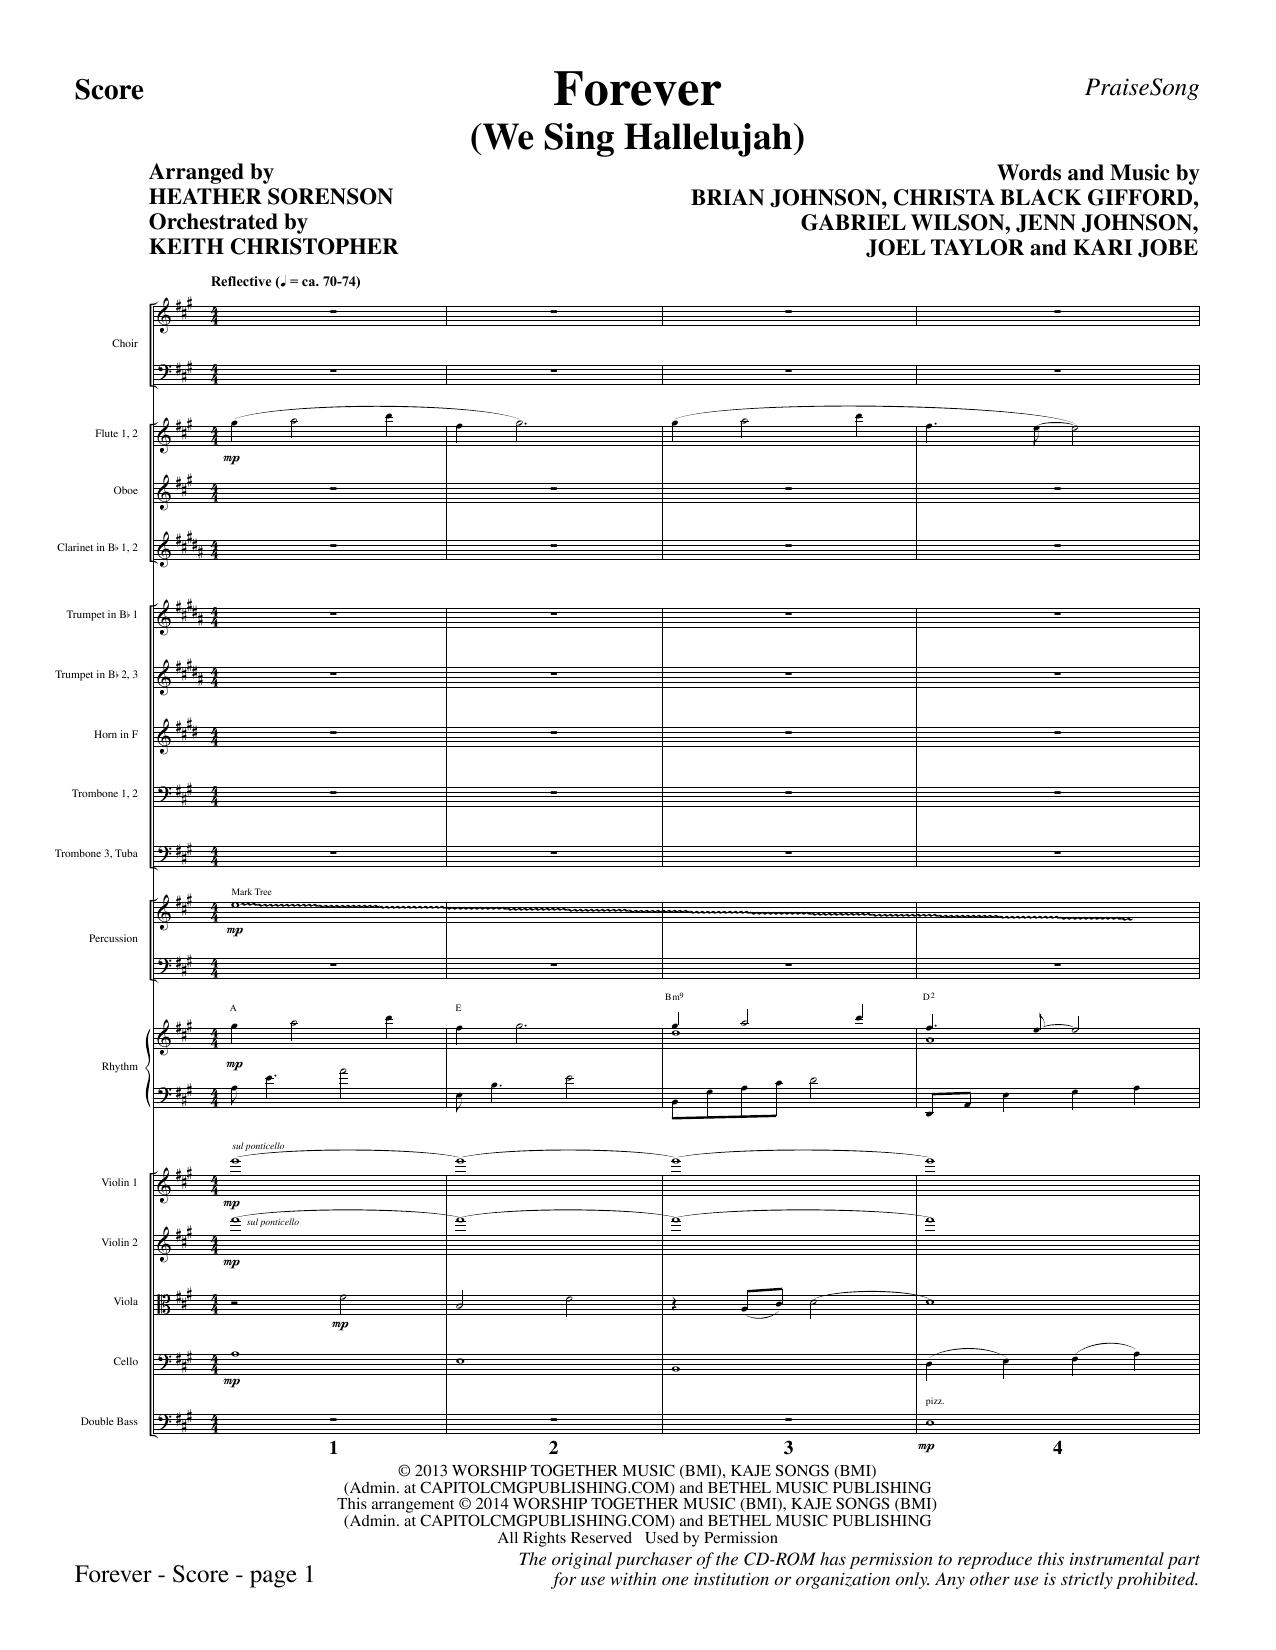 Forever (We Sing Hallelujah) - Full Score Sheet Music